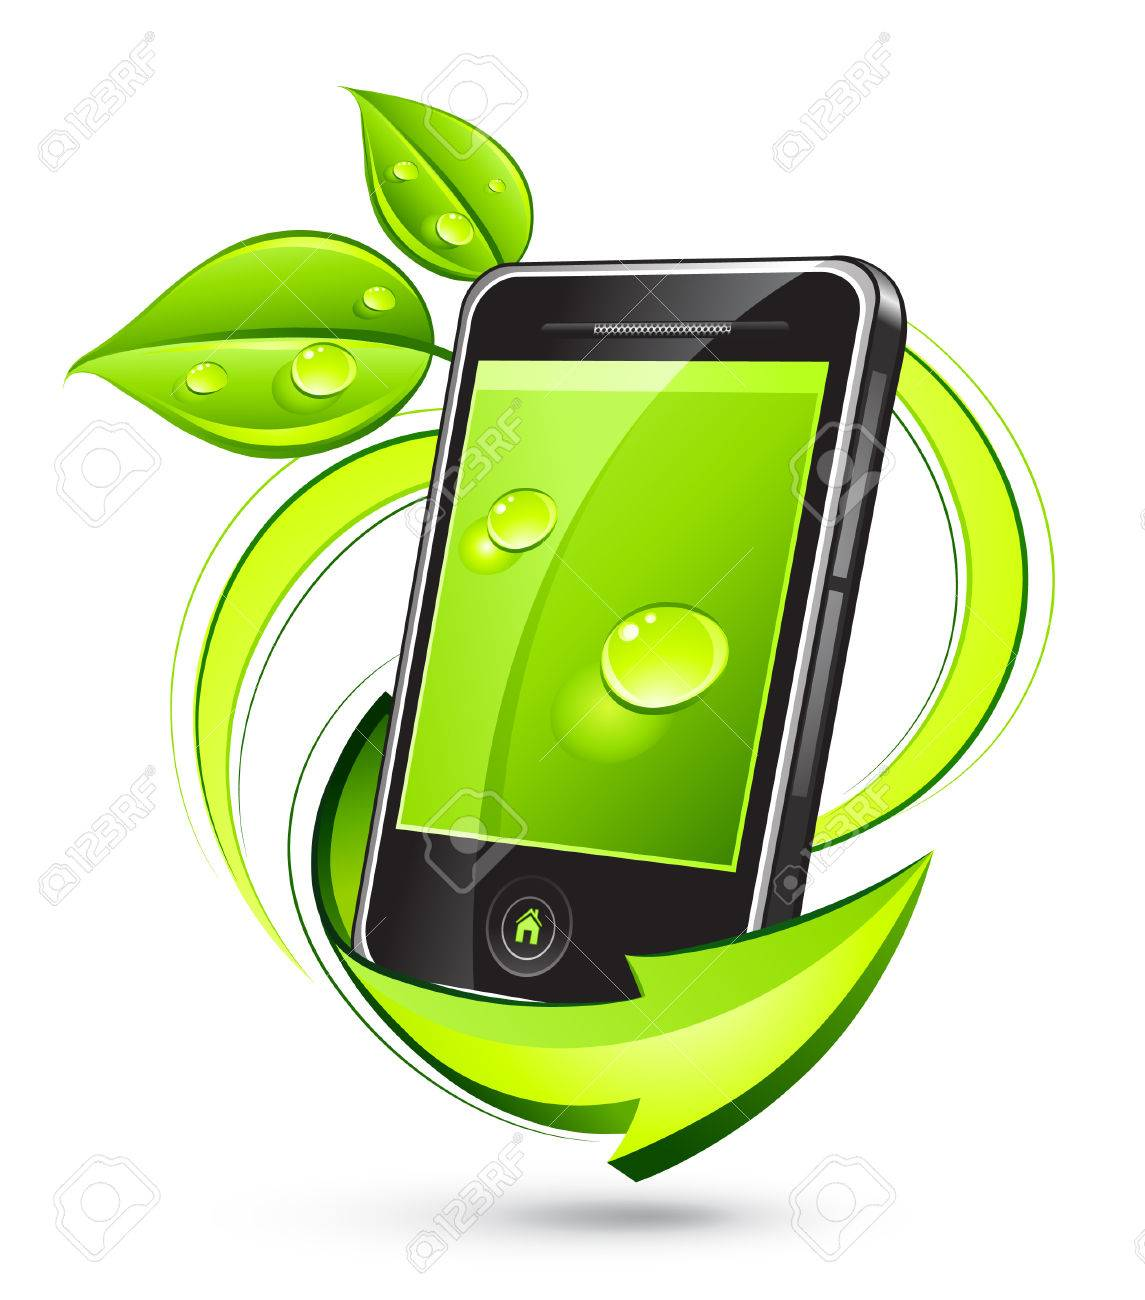 Green phone Stock Vector - 7117058